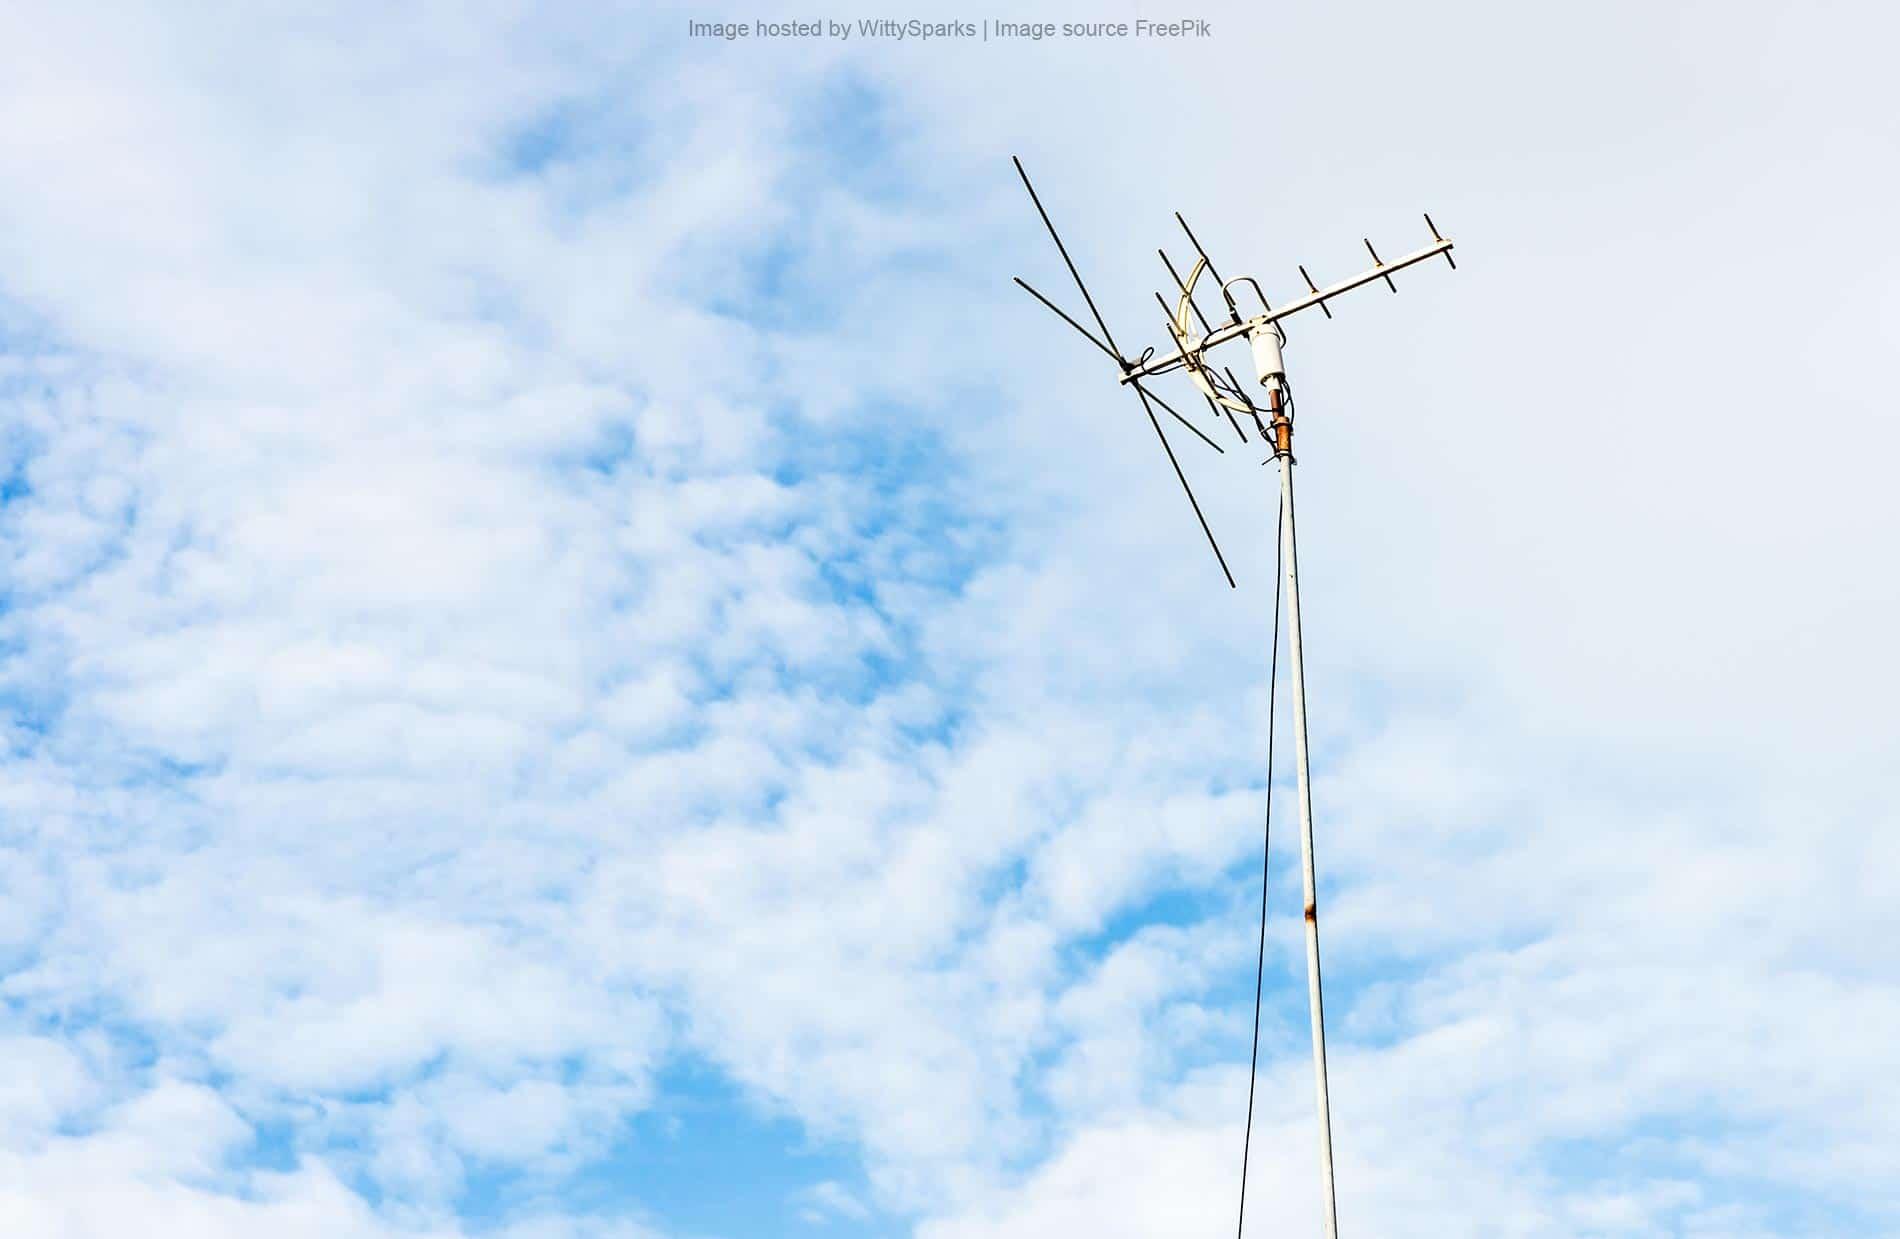 Television antennas in rural areas